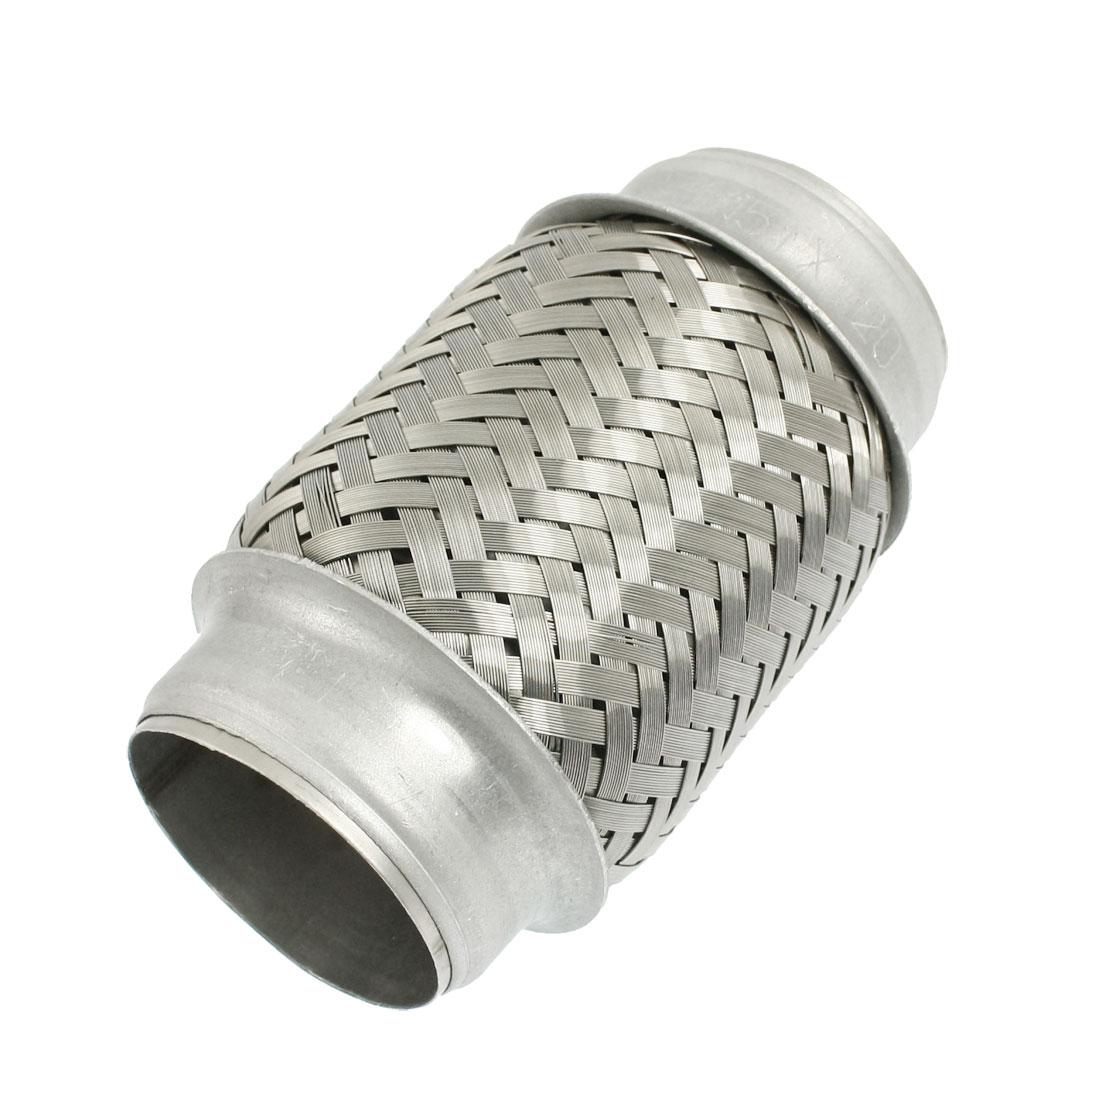 Silver Tone Car Exhaust Pipe Silencer Muffler Tip 51mm x 120mm